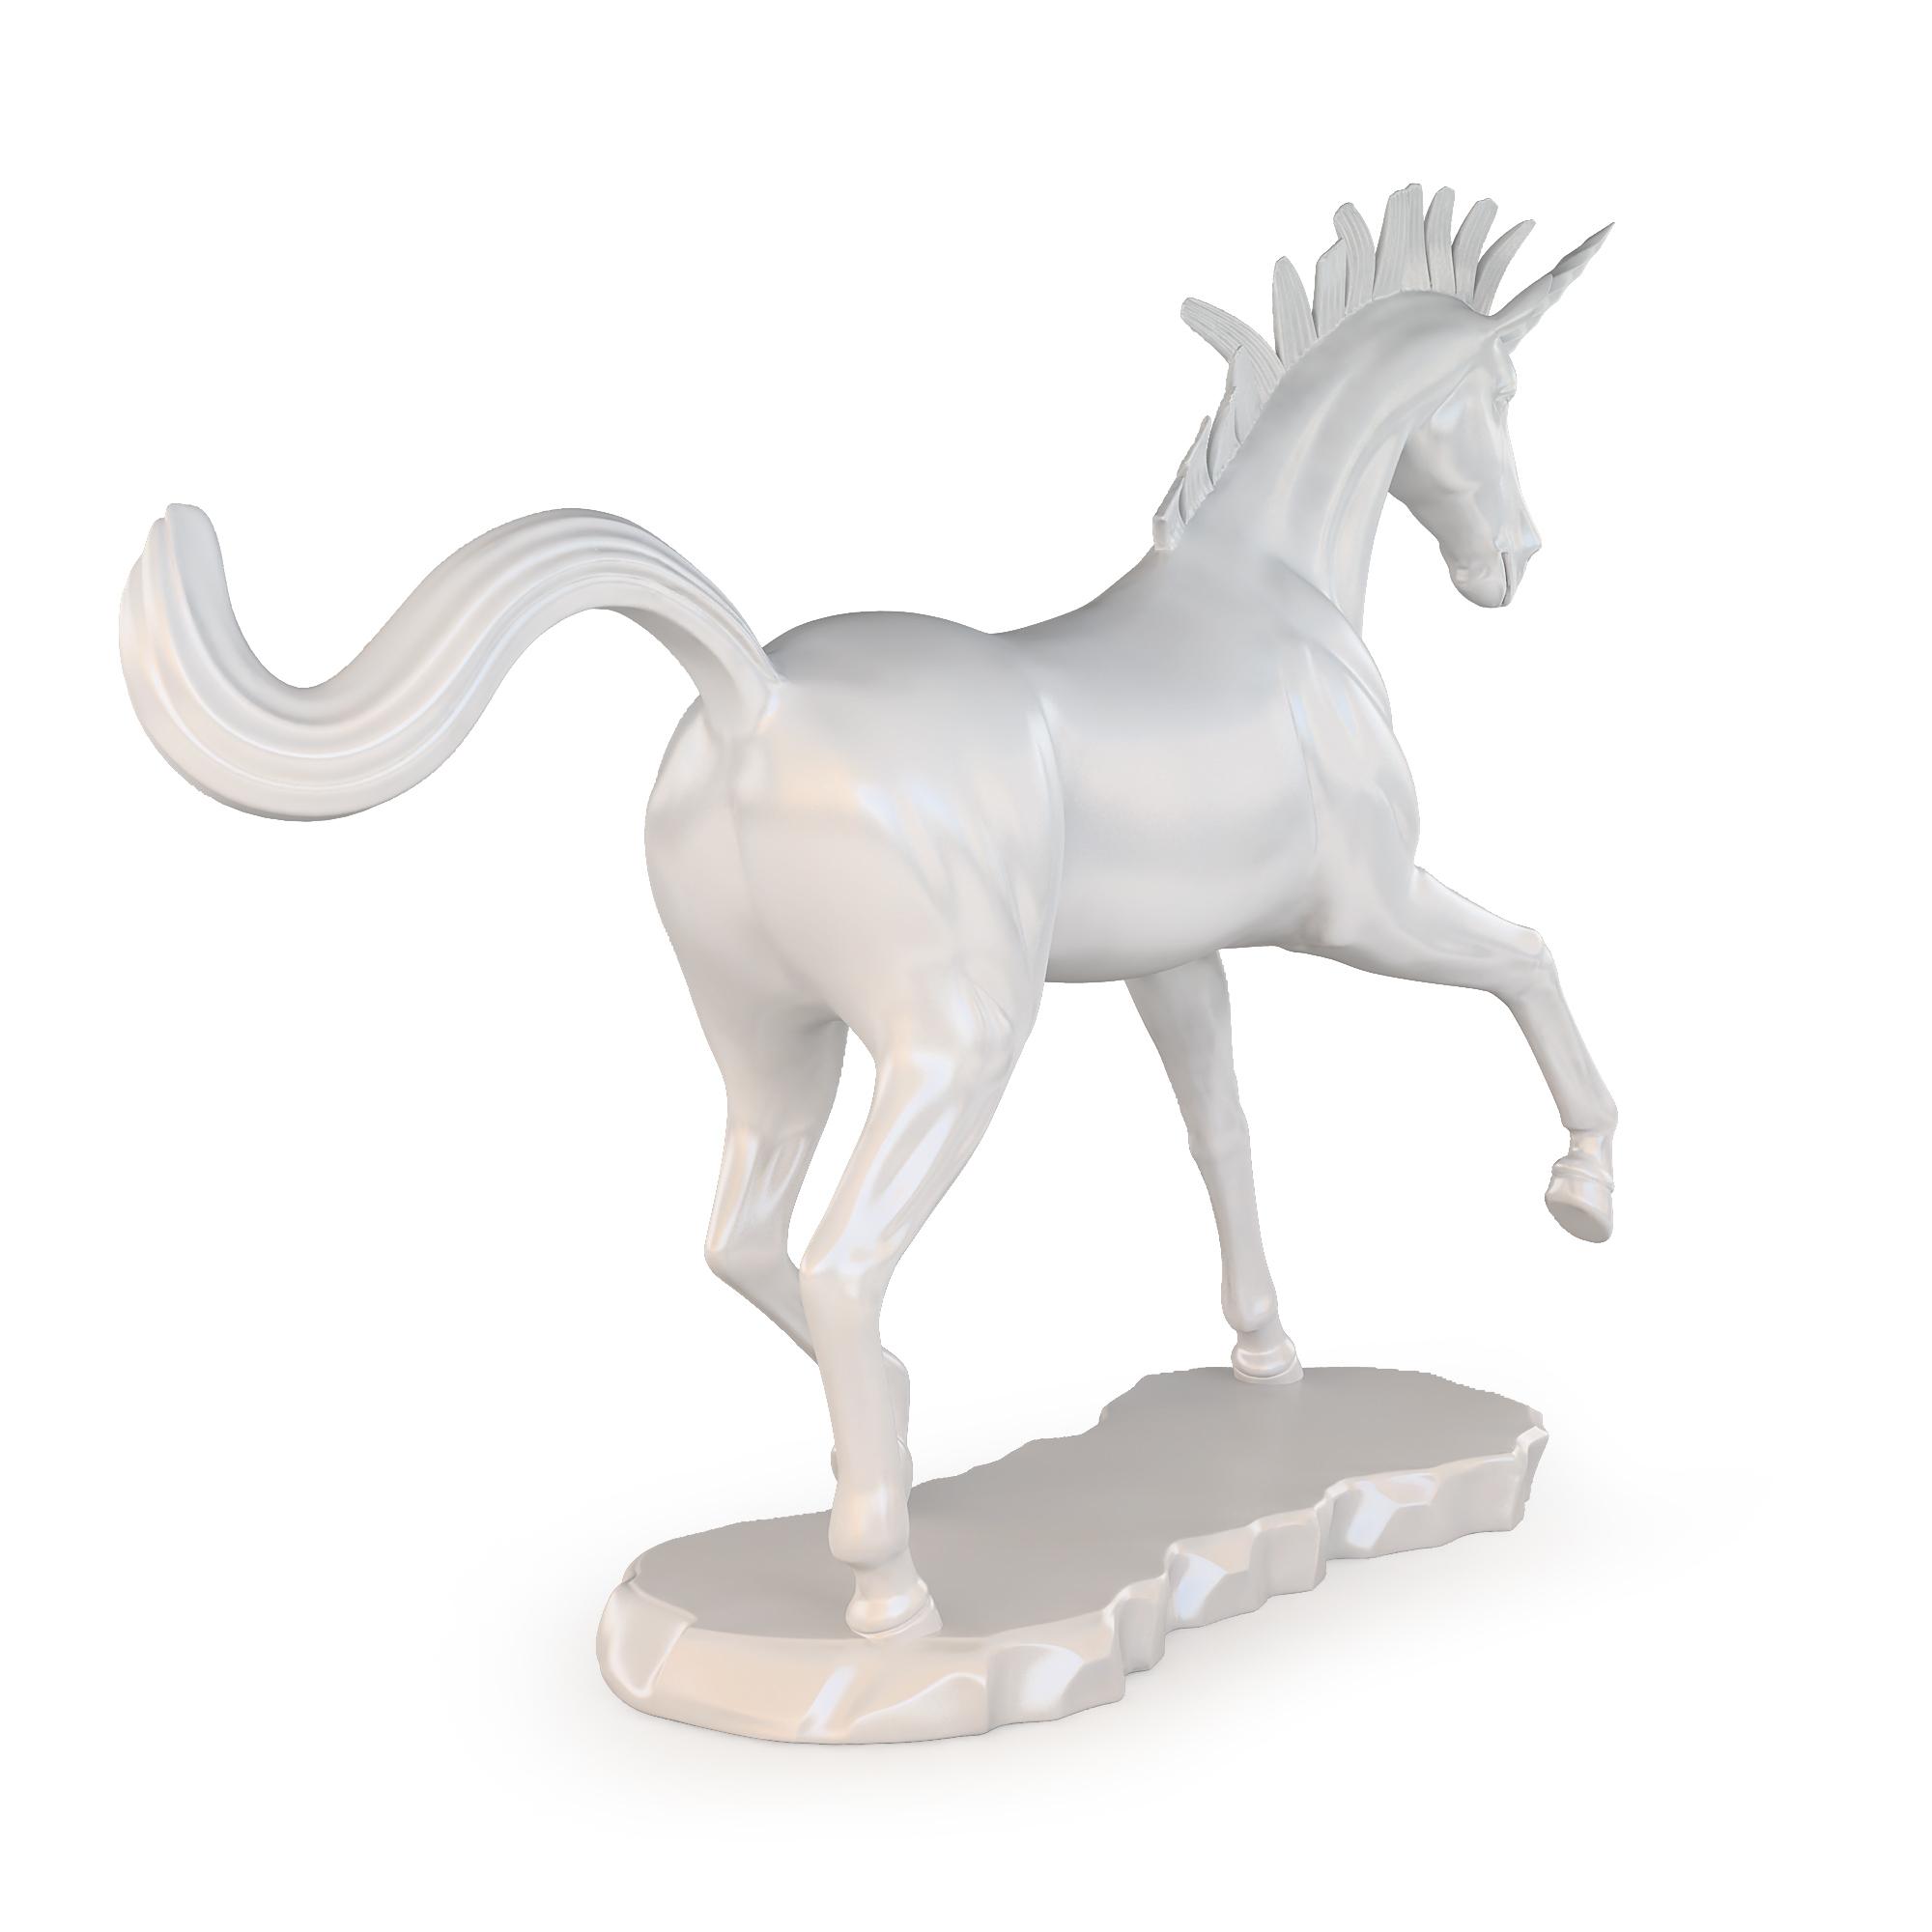 unicorn sculpture pinshape